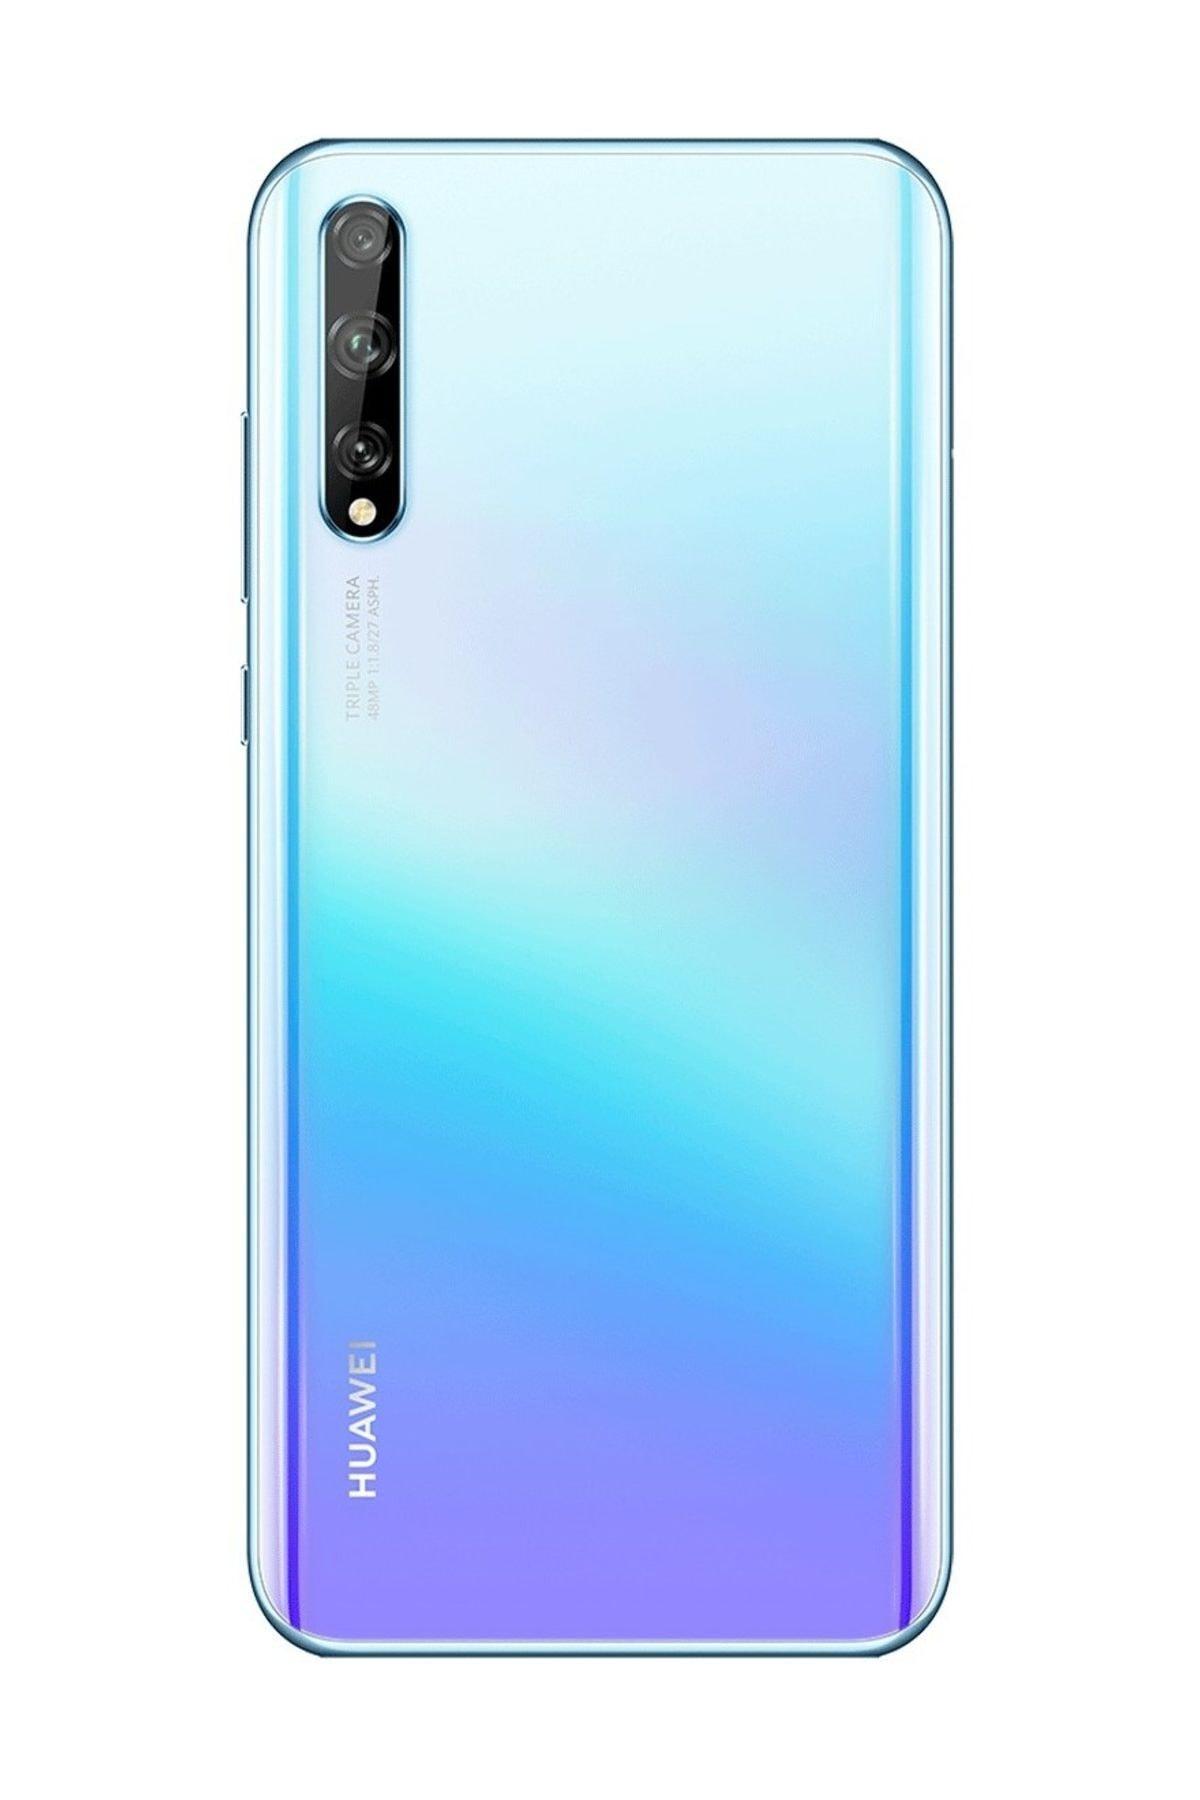 Huawei P Smart S Duos 128 GB Kristal Beyazı Cep Telefonu (Huawei Türkiye Garantili) 2